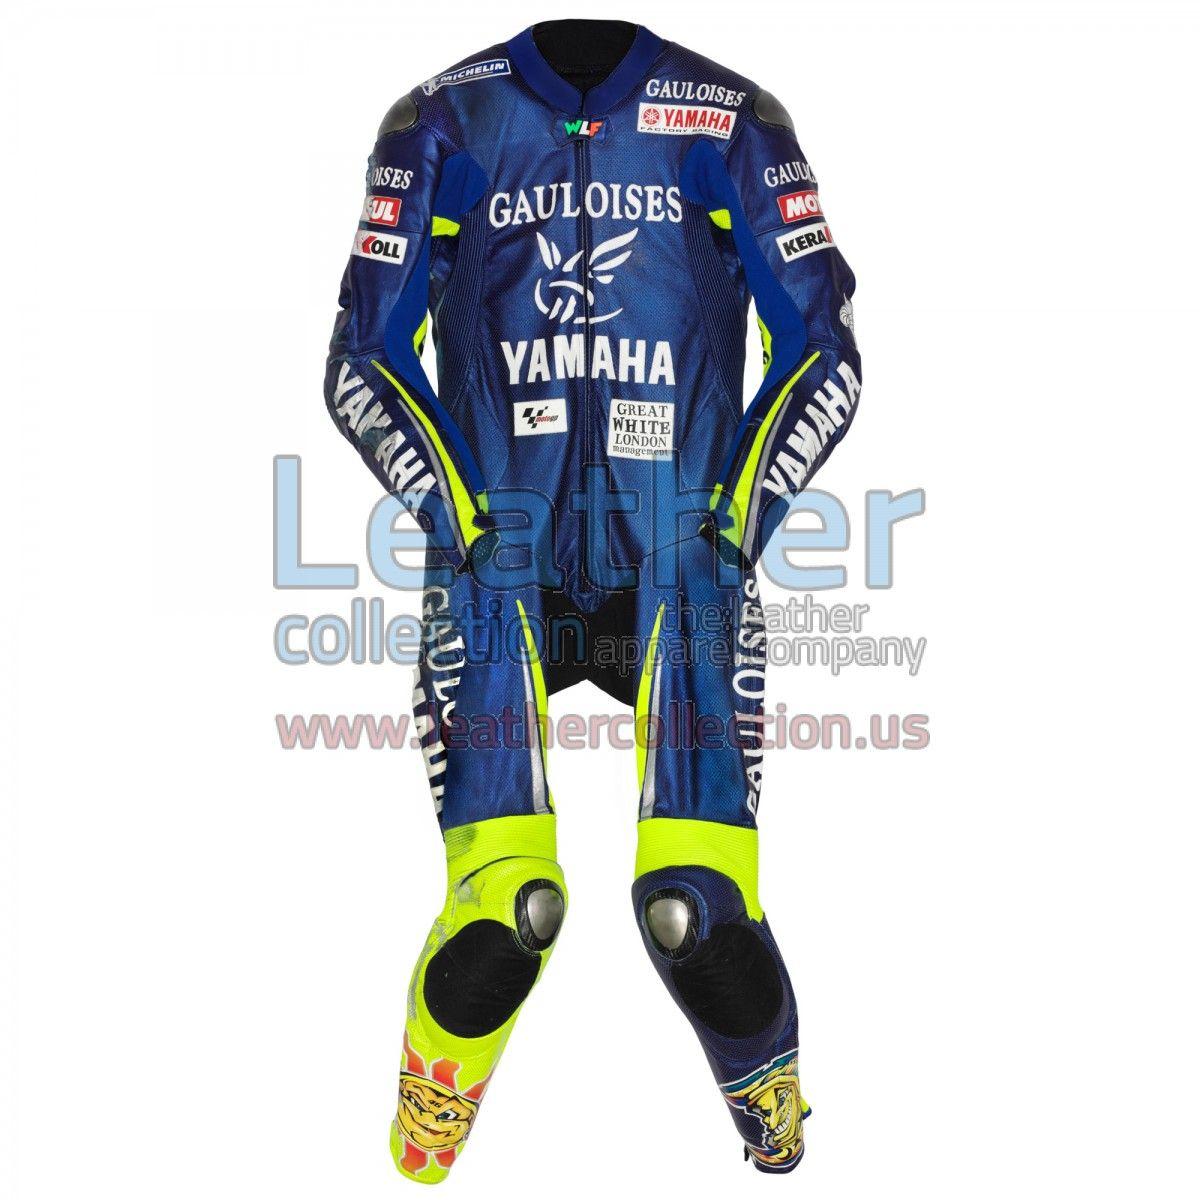 Valentino Rossi Yamaha MotoGP 2005 Race Suit - https://www.leathercollection.us/en-we/valentino-rossi-yamaha-race-suit.html Valentino Rossi, Valentino Rossi race suit #ValentinoRossi, #ValentinoRossiRaceSuit